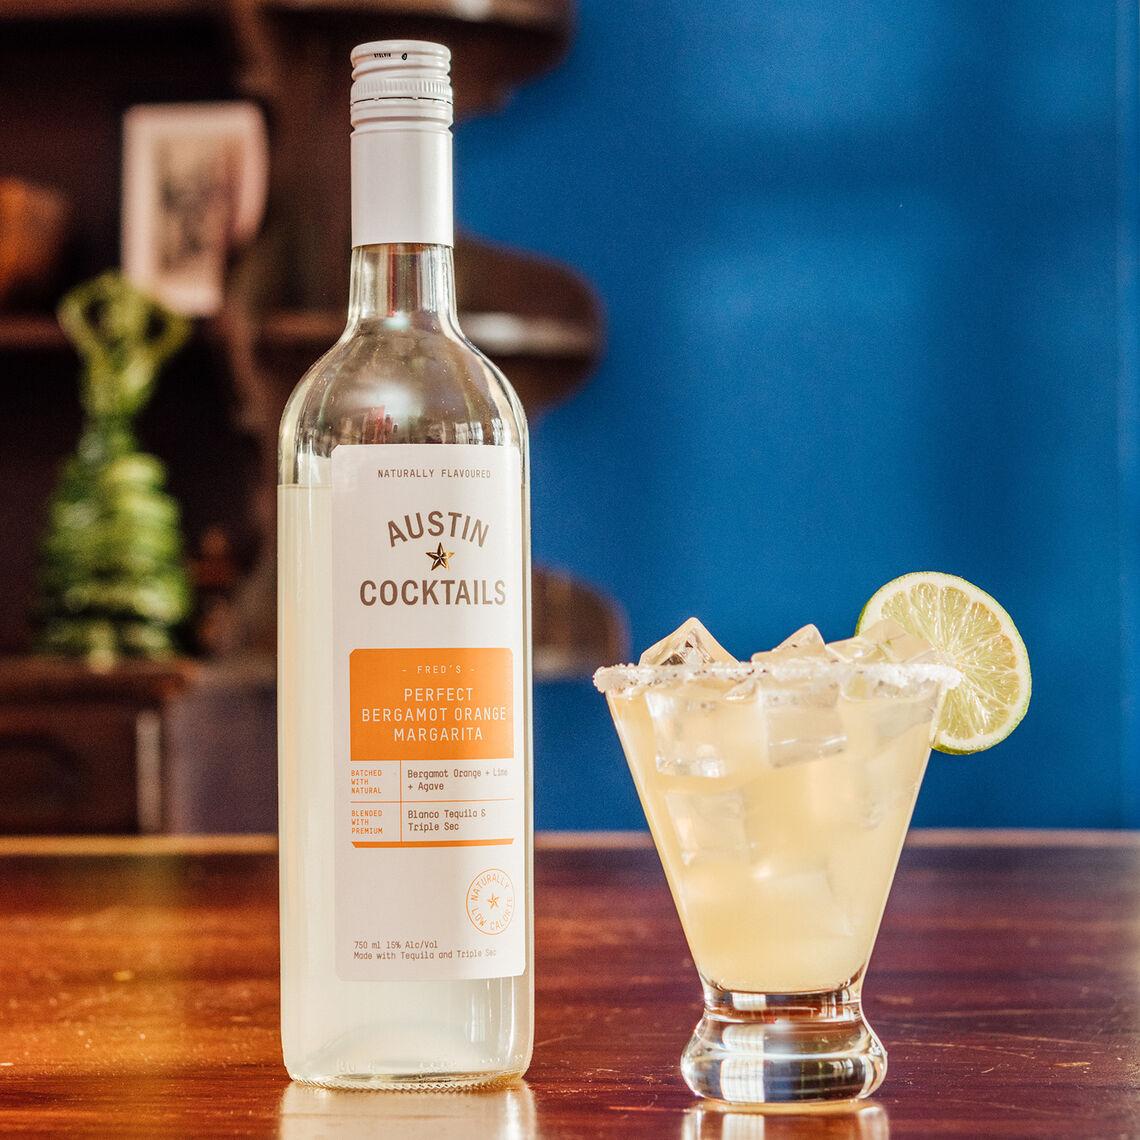 margarita bottle image